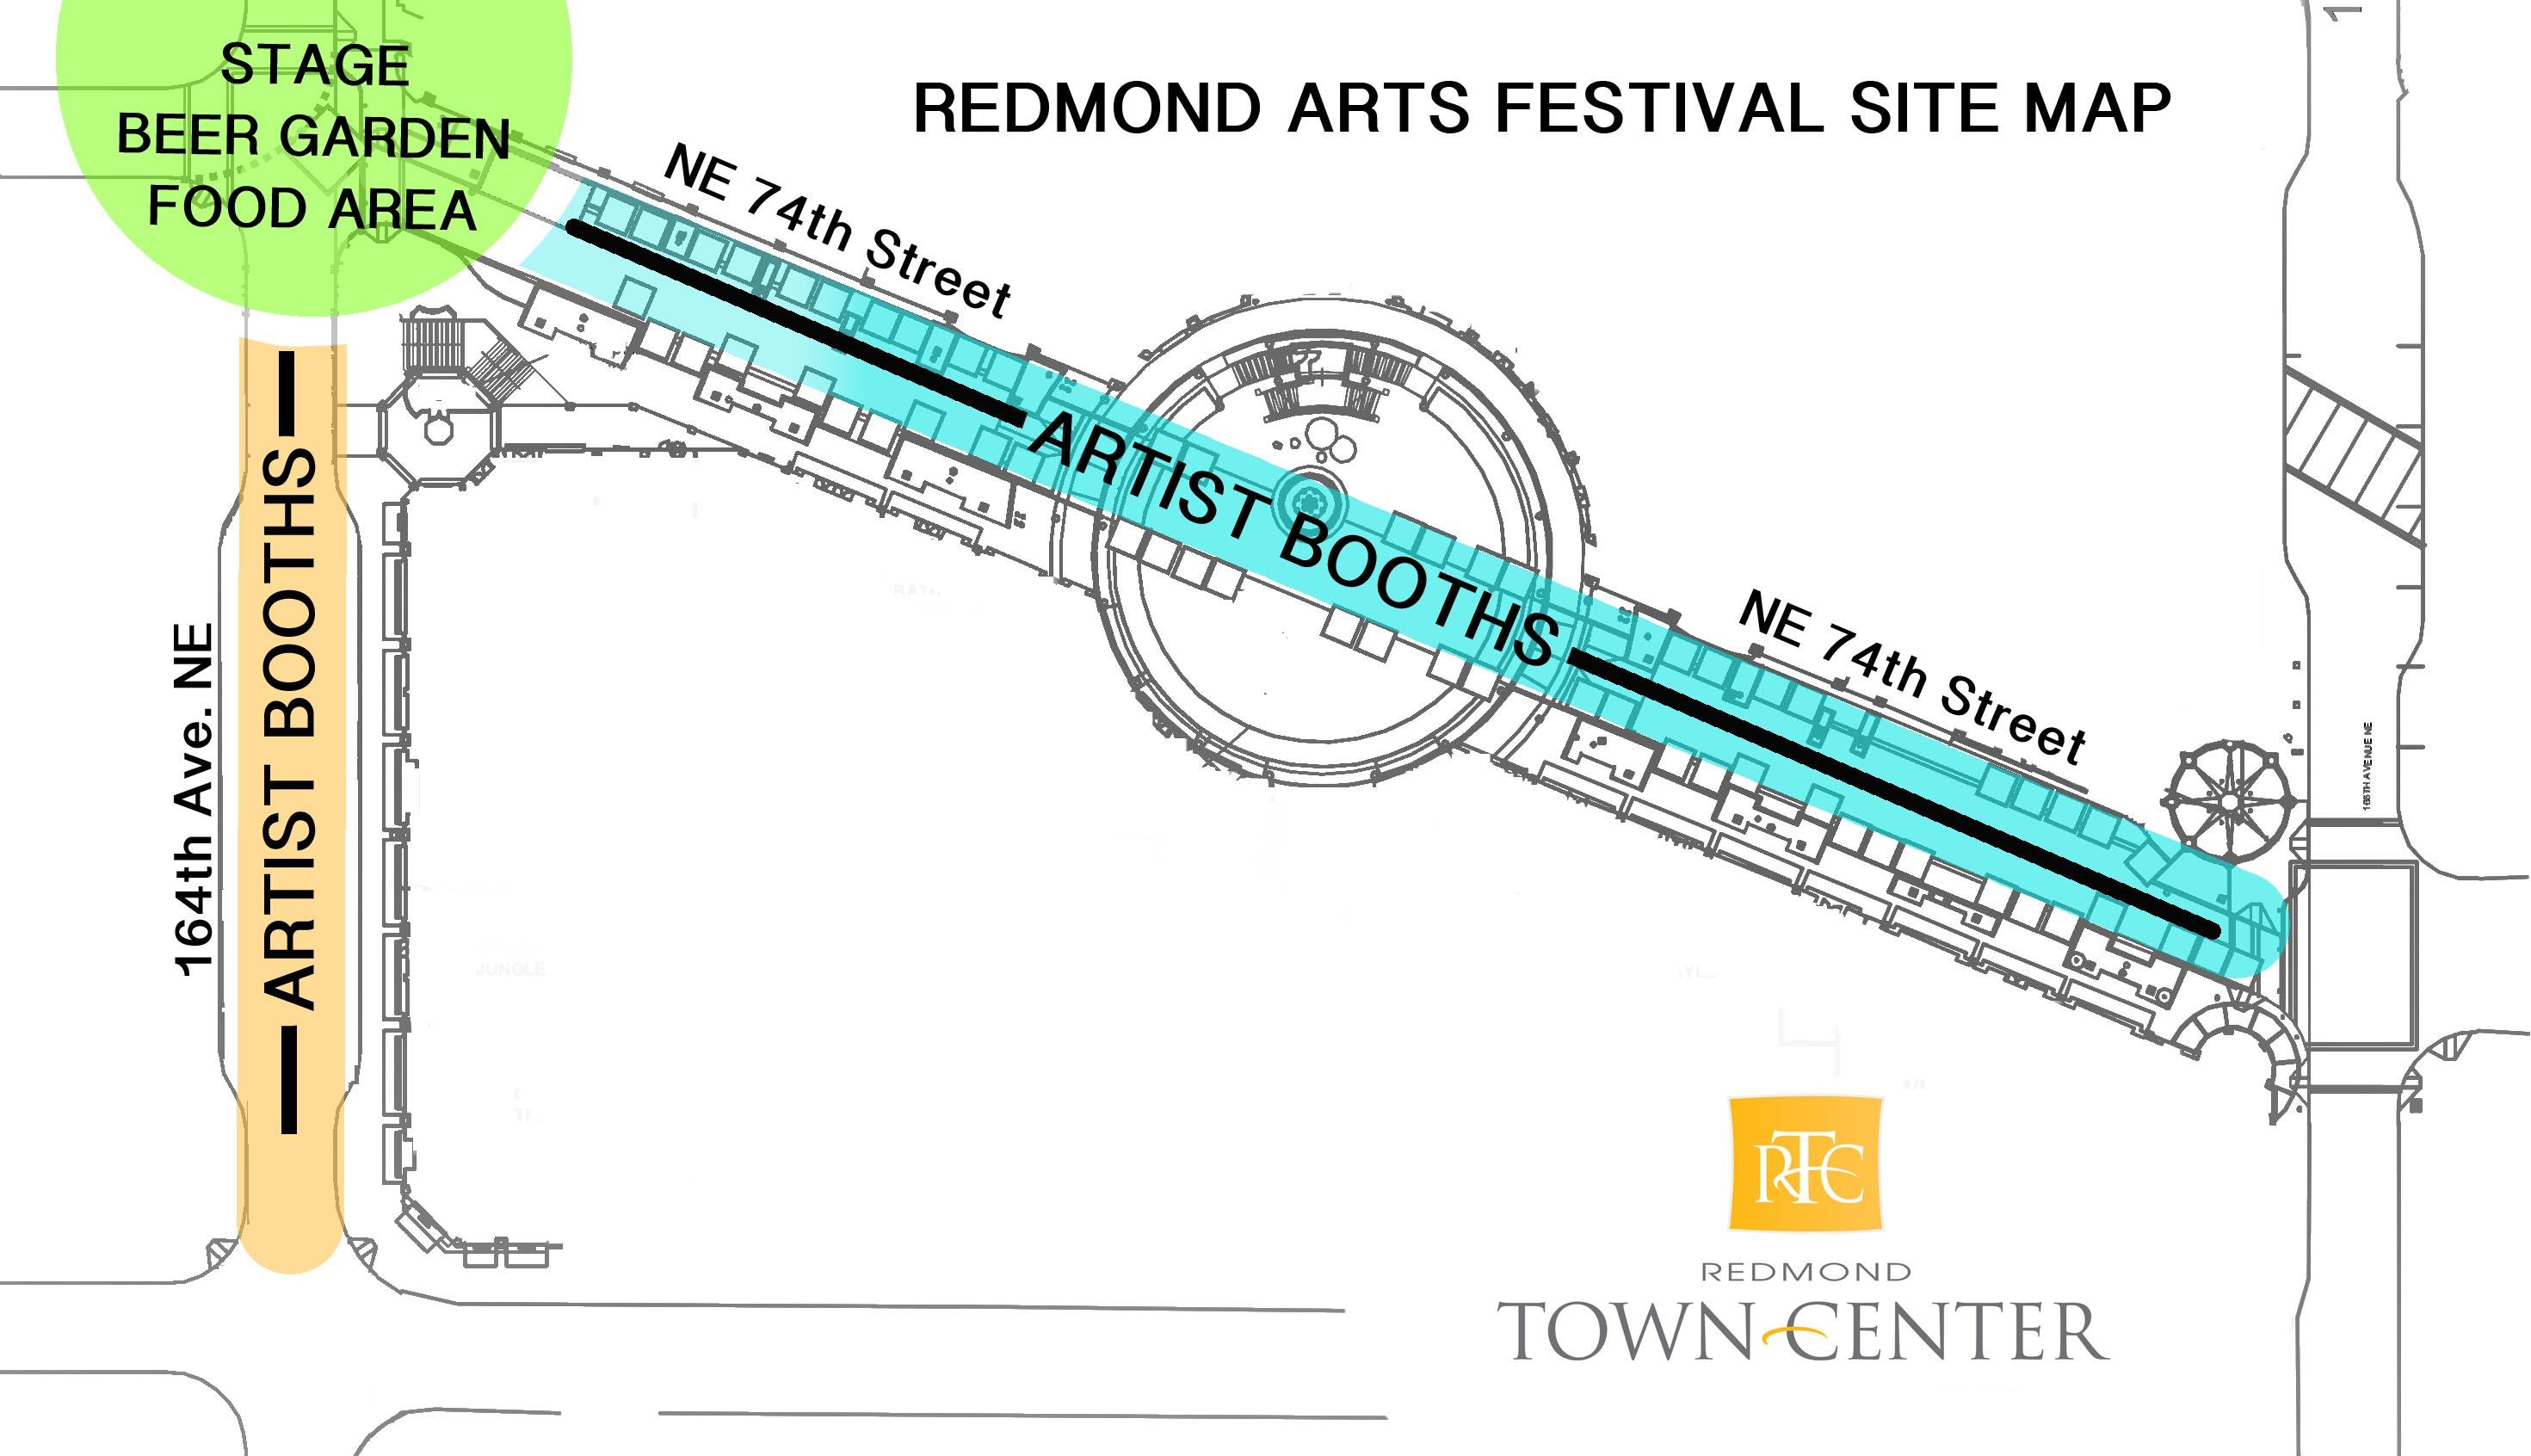 Redmond Arts Festival 2019